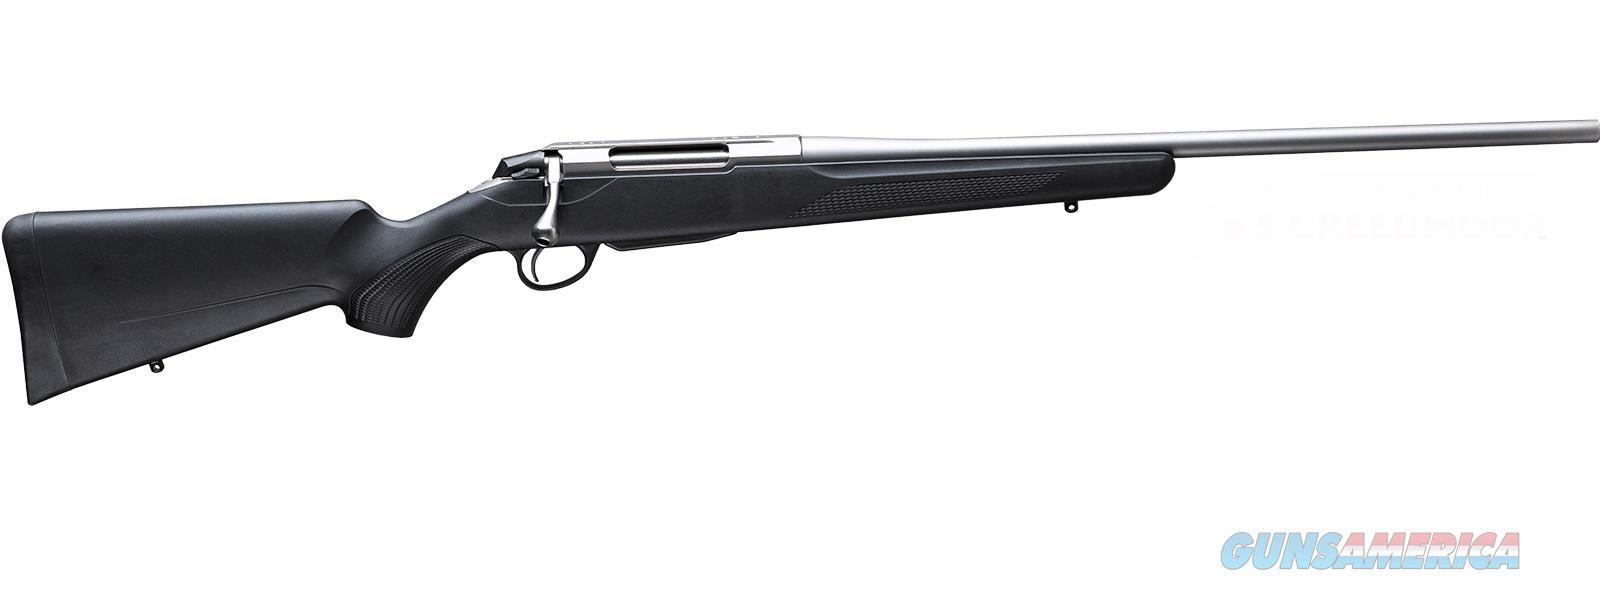 "Tikka T3X Lite Stainless .243 Winchester 22.4"" JRTXB315   Guns > Rifles > Tikka Rifles > T3"